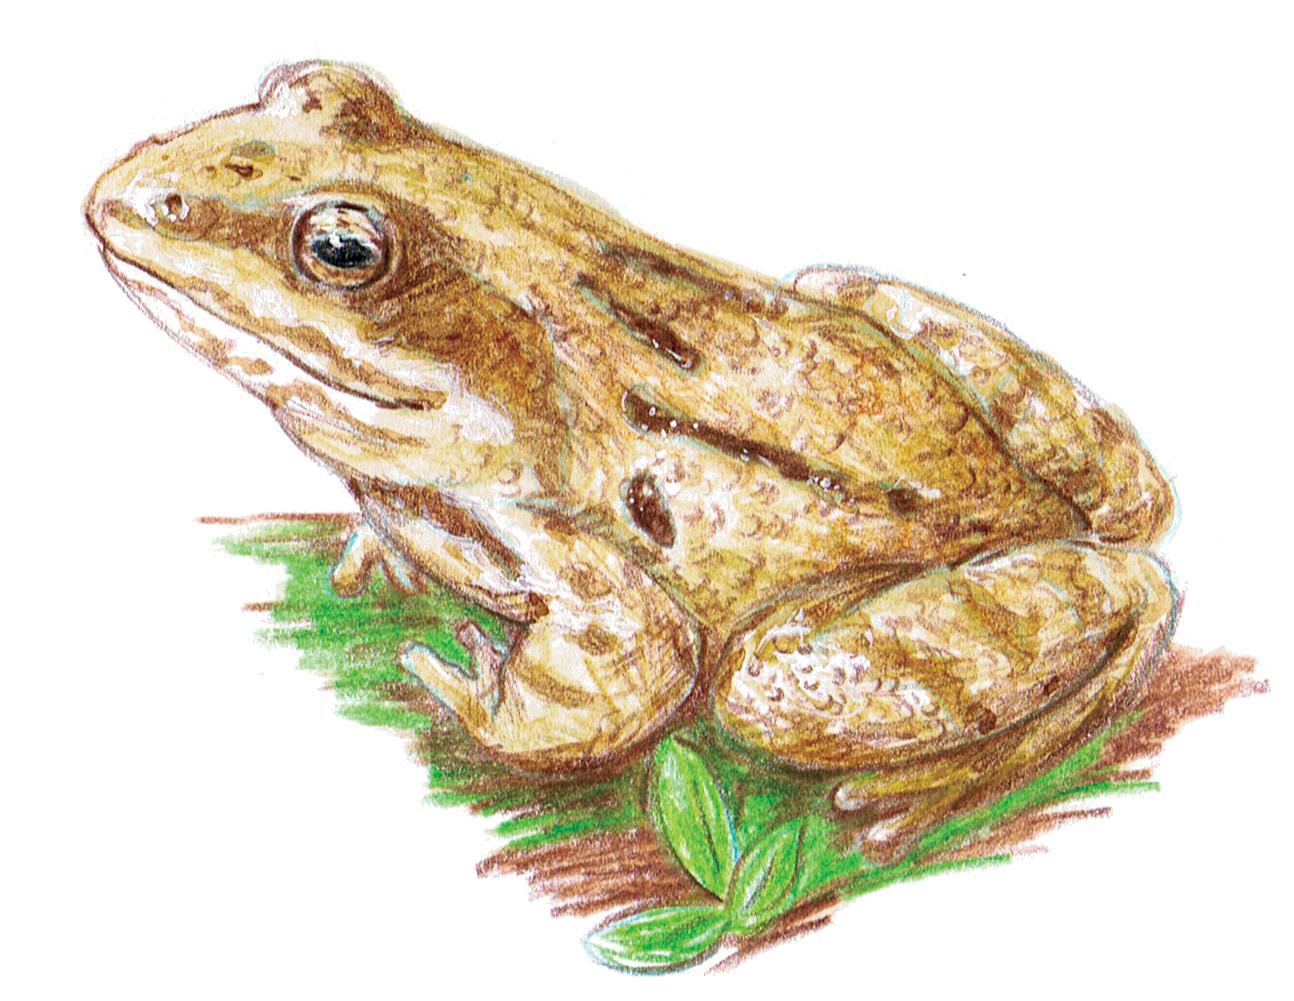 grenouille roussette